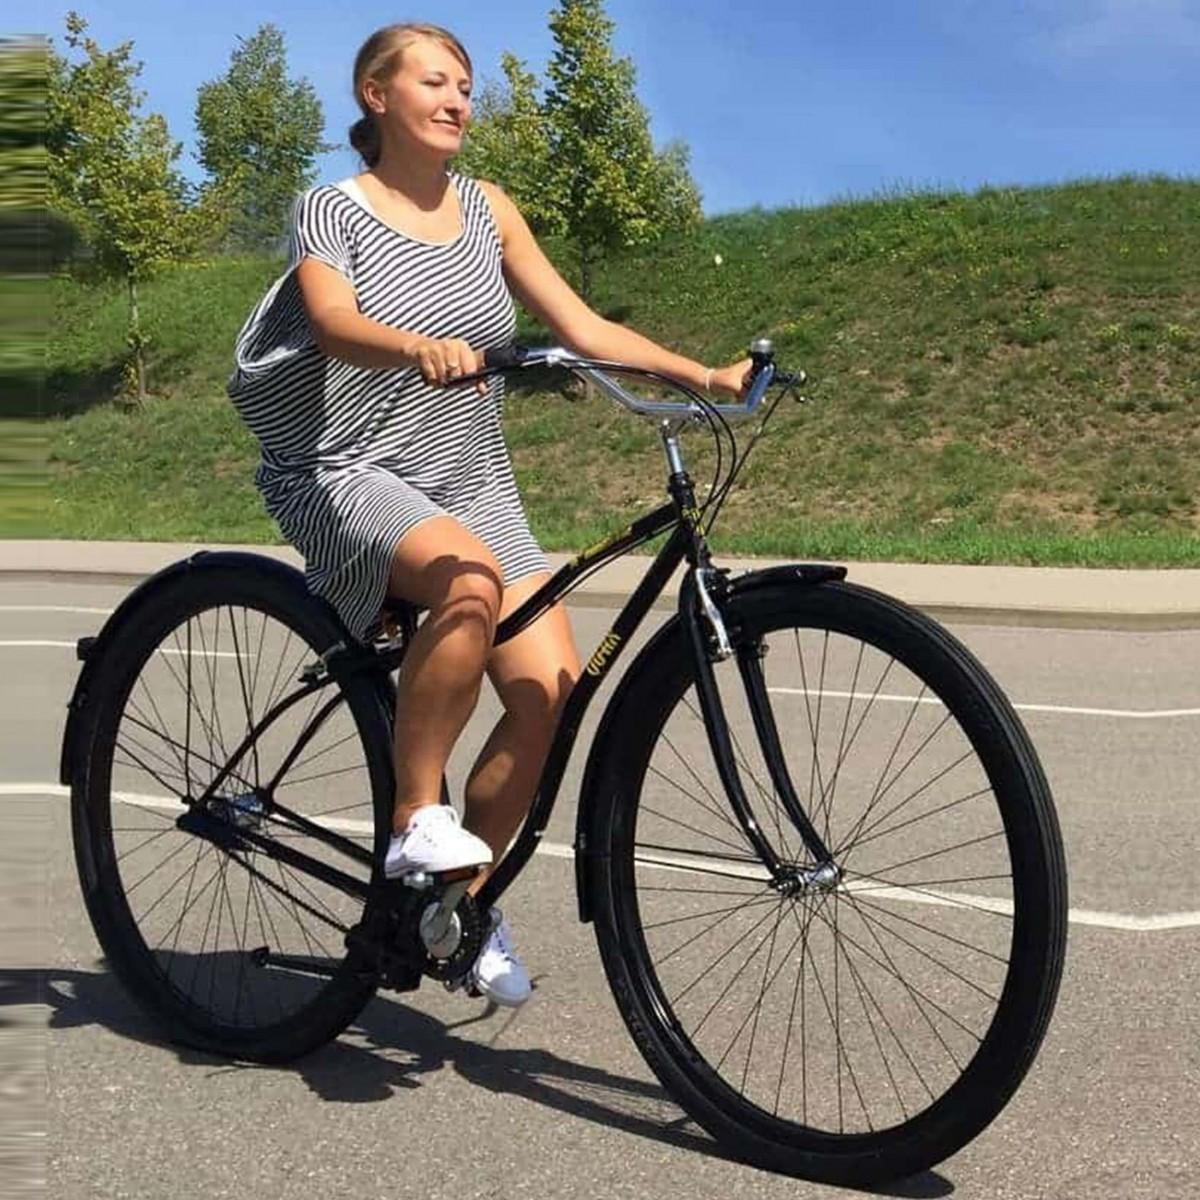 Monster bike - bici gigante